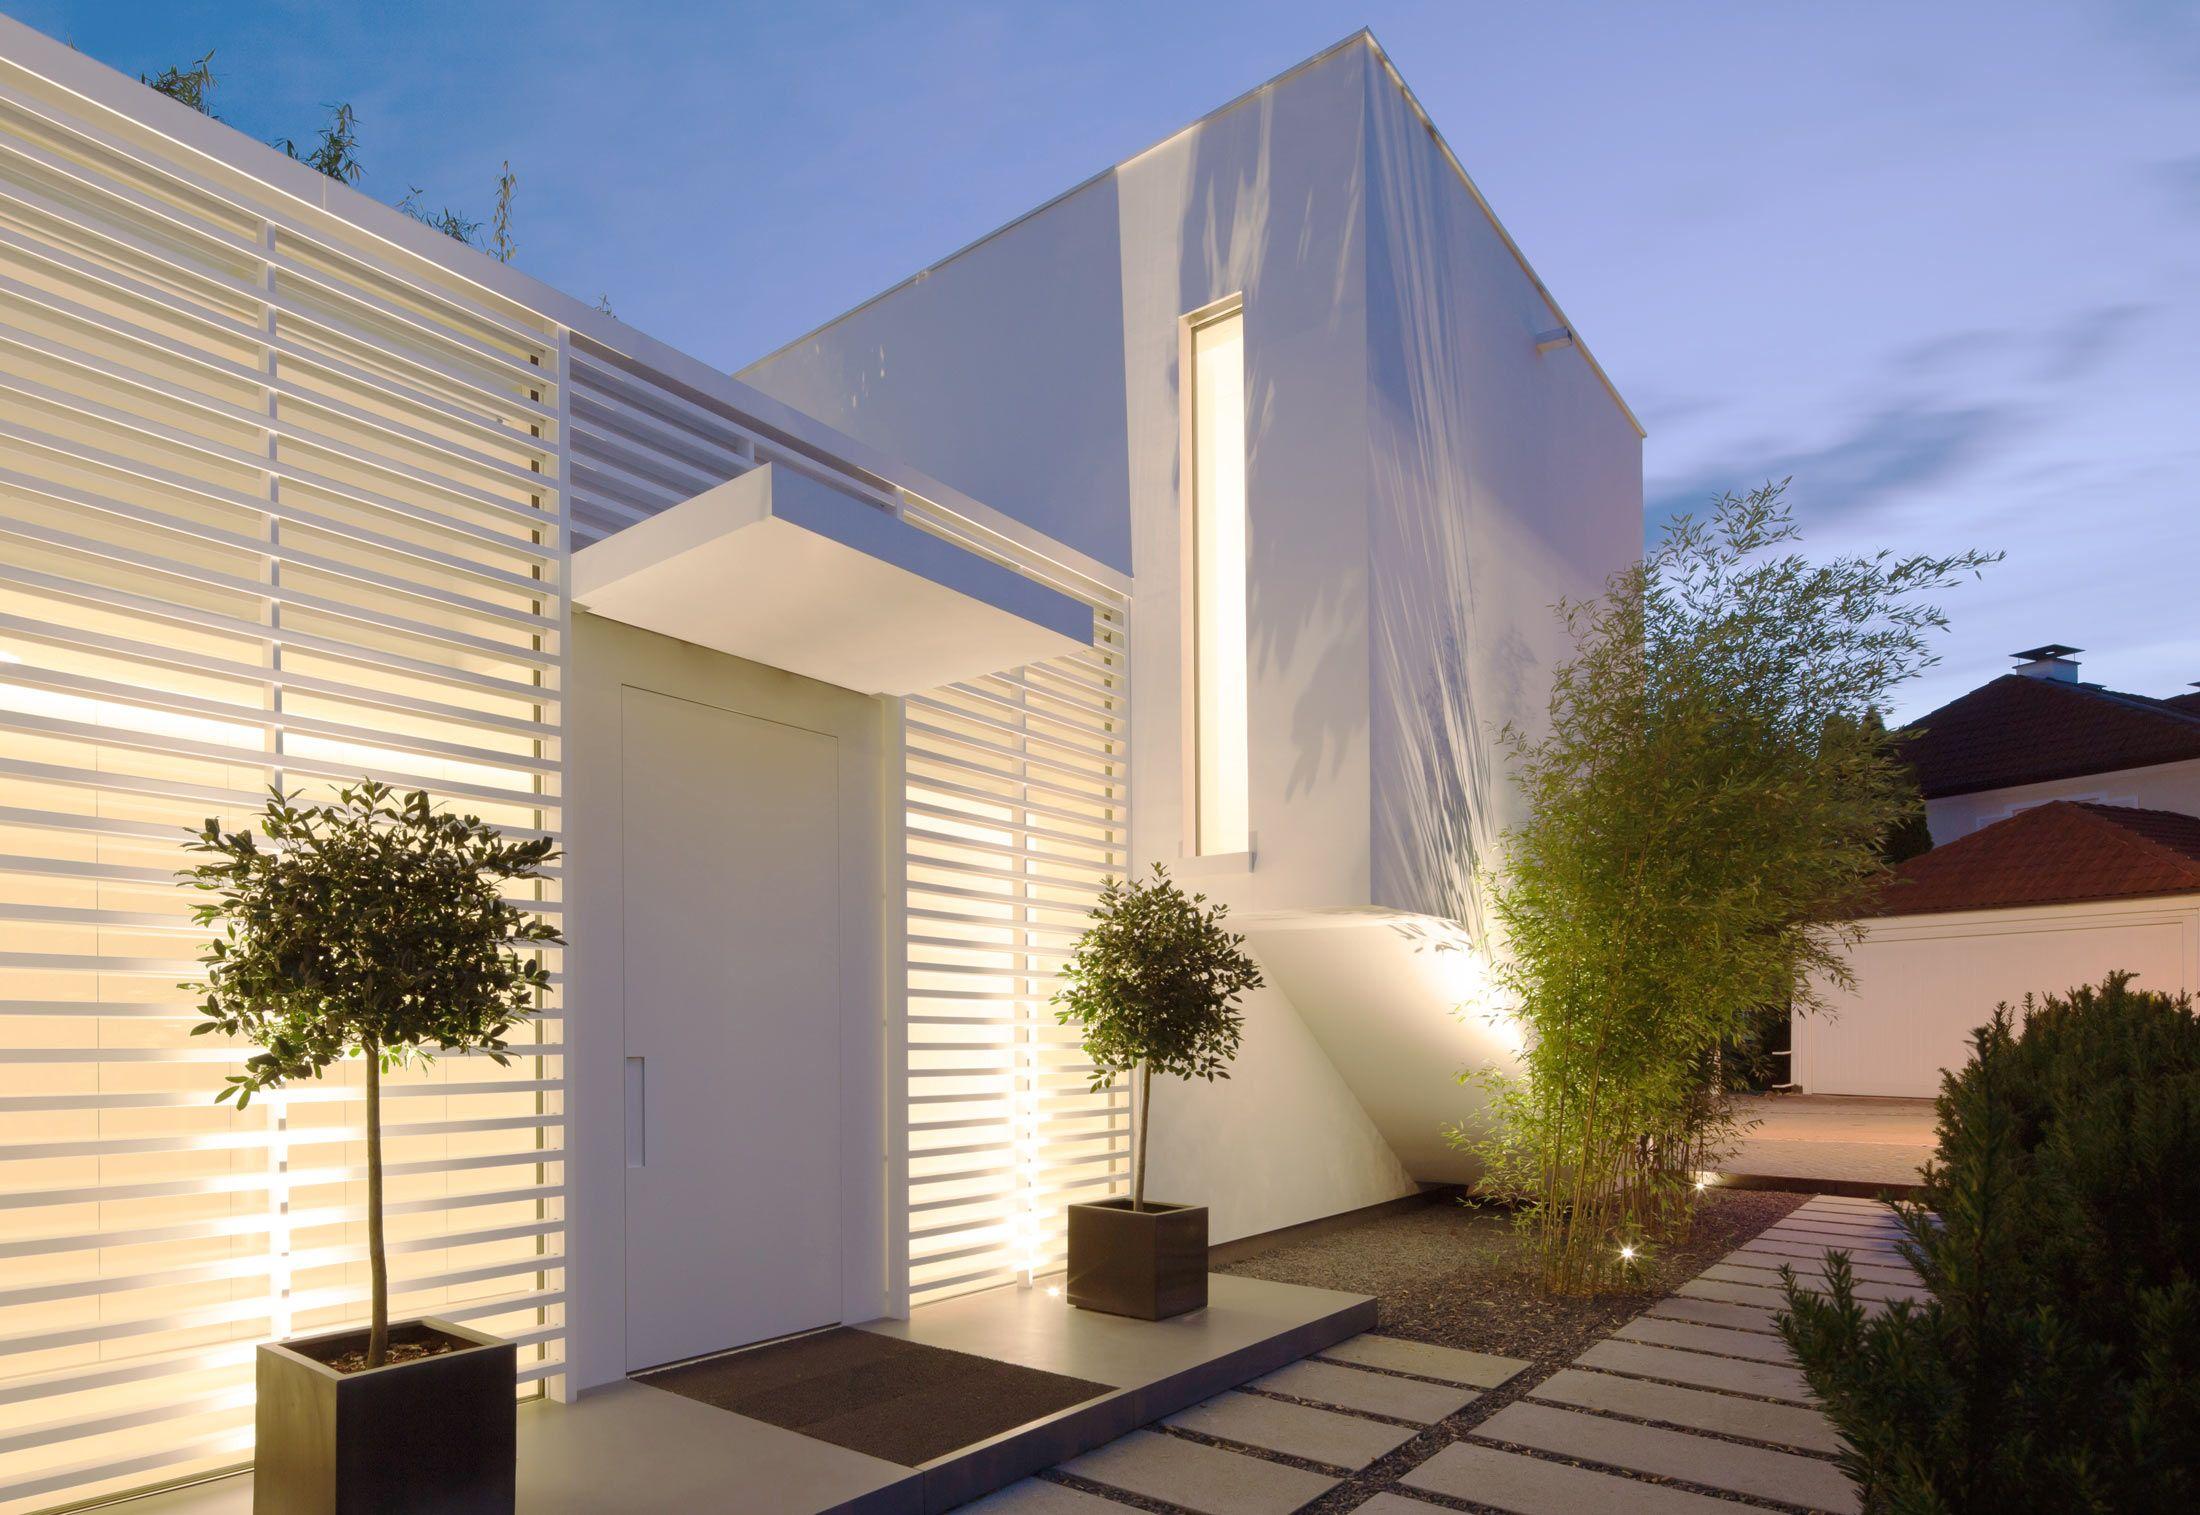 HI-MACS Solid Alpine White, Privat Haus, Bavaria   Doors   Pinterest ...